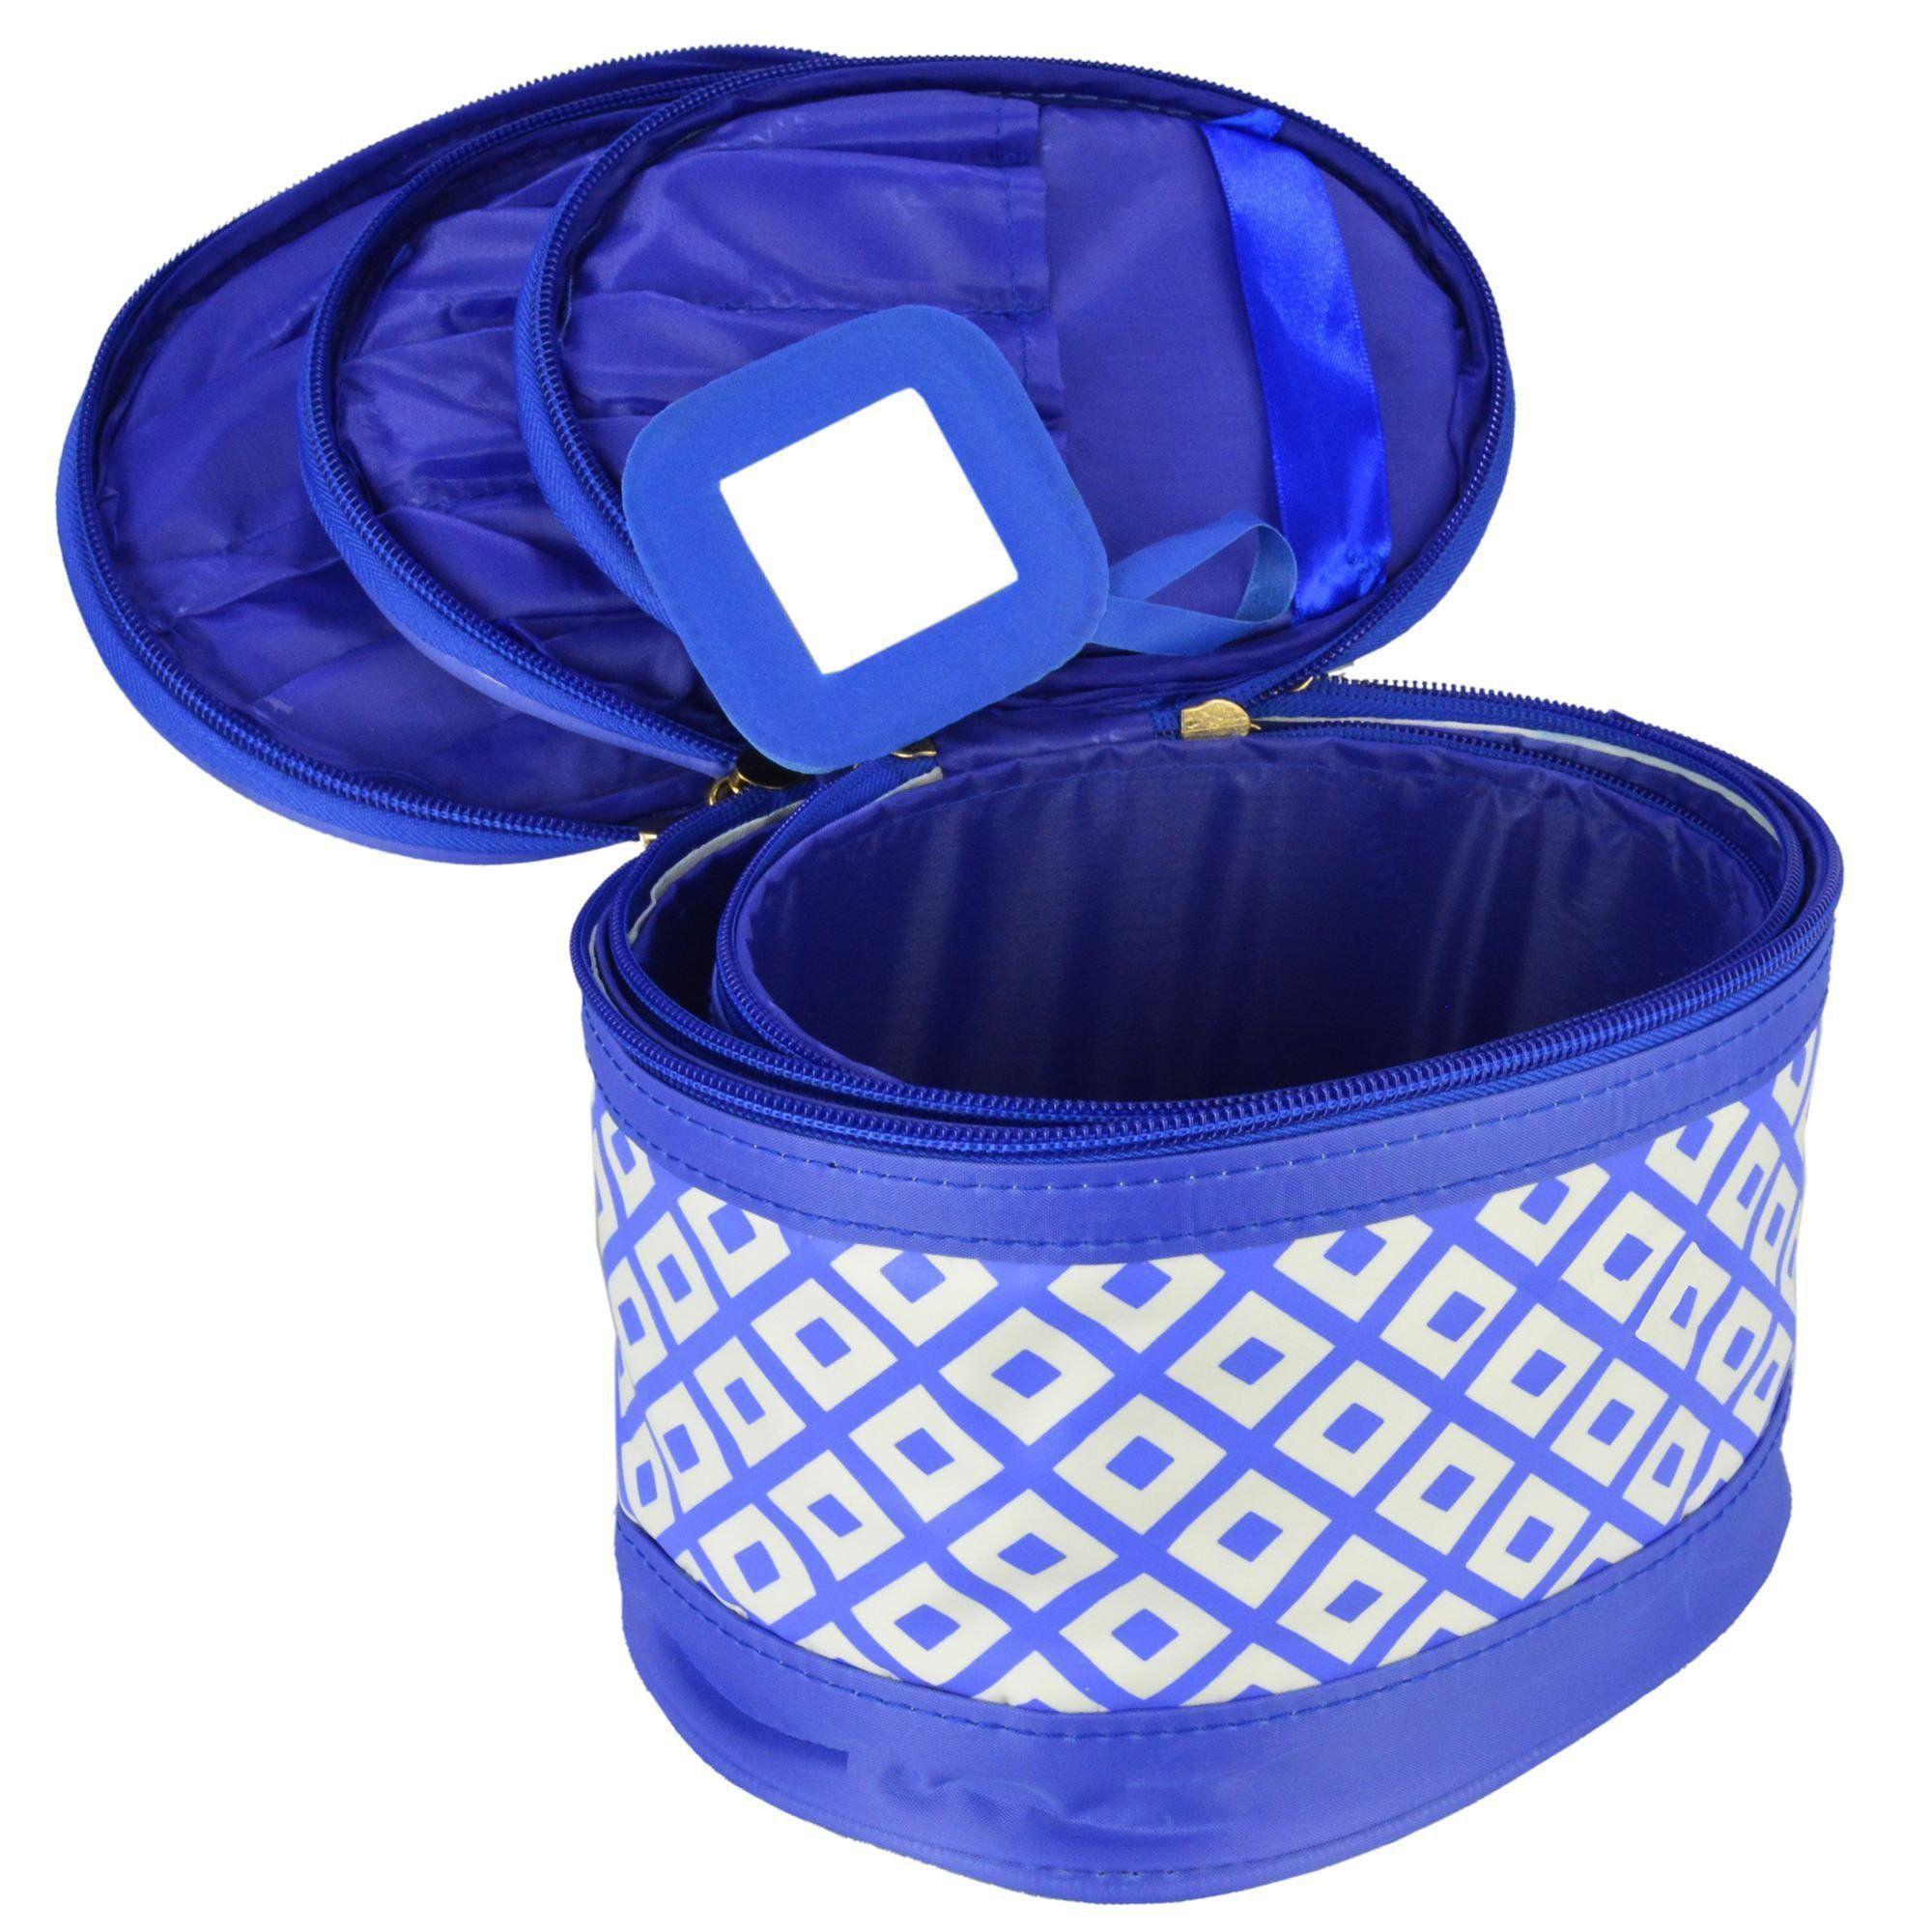 Frasqueiras Necessaire Feminina Azul Kit 3 Peças CBRN08322